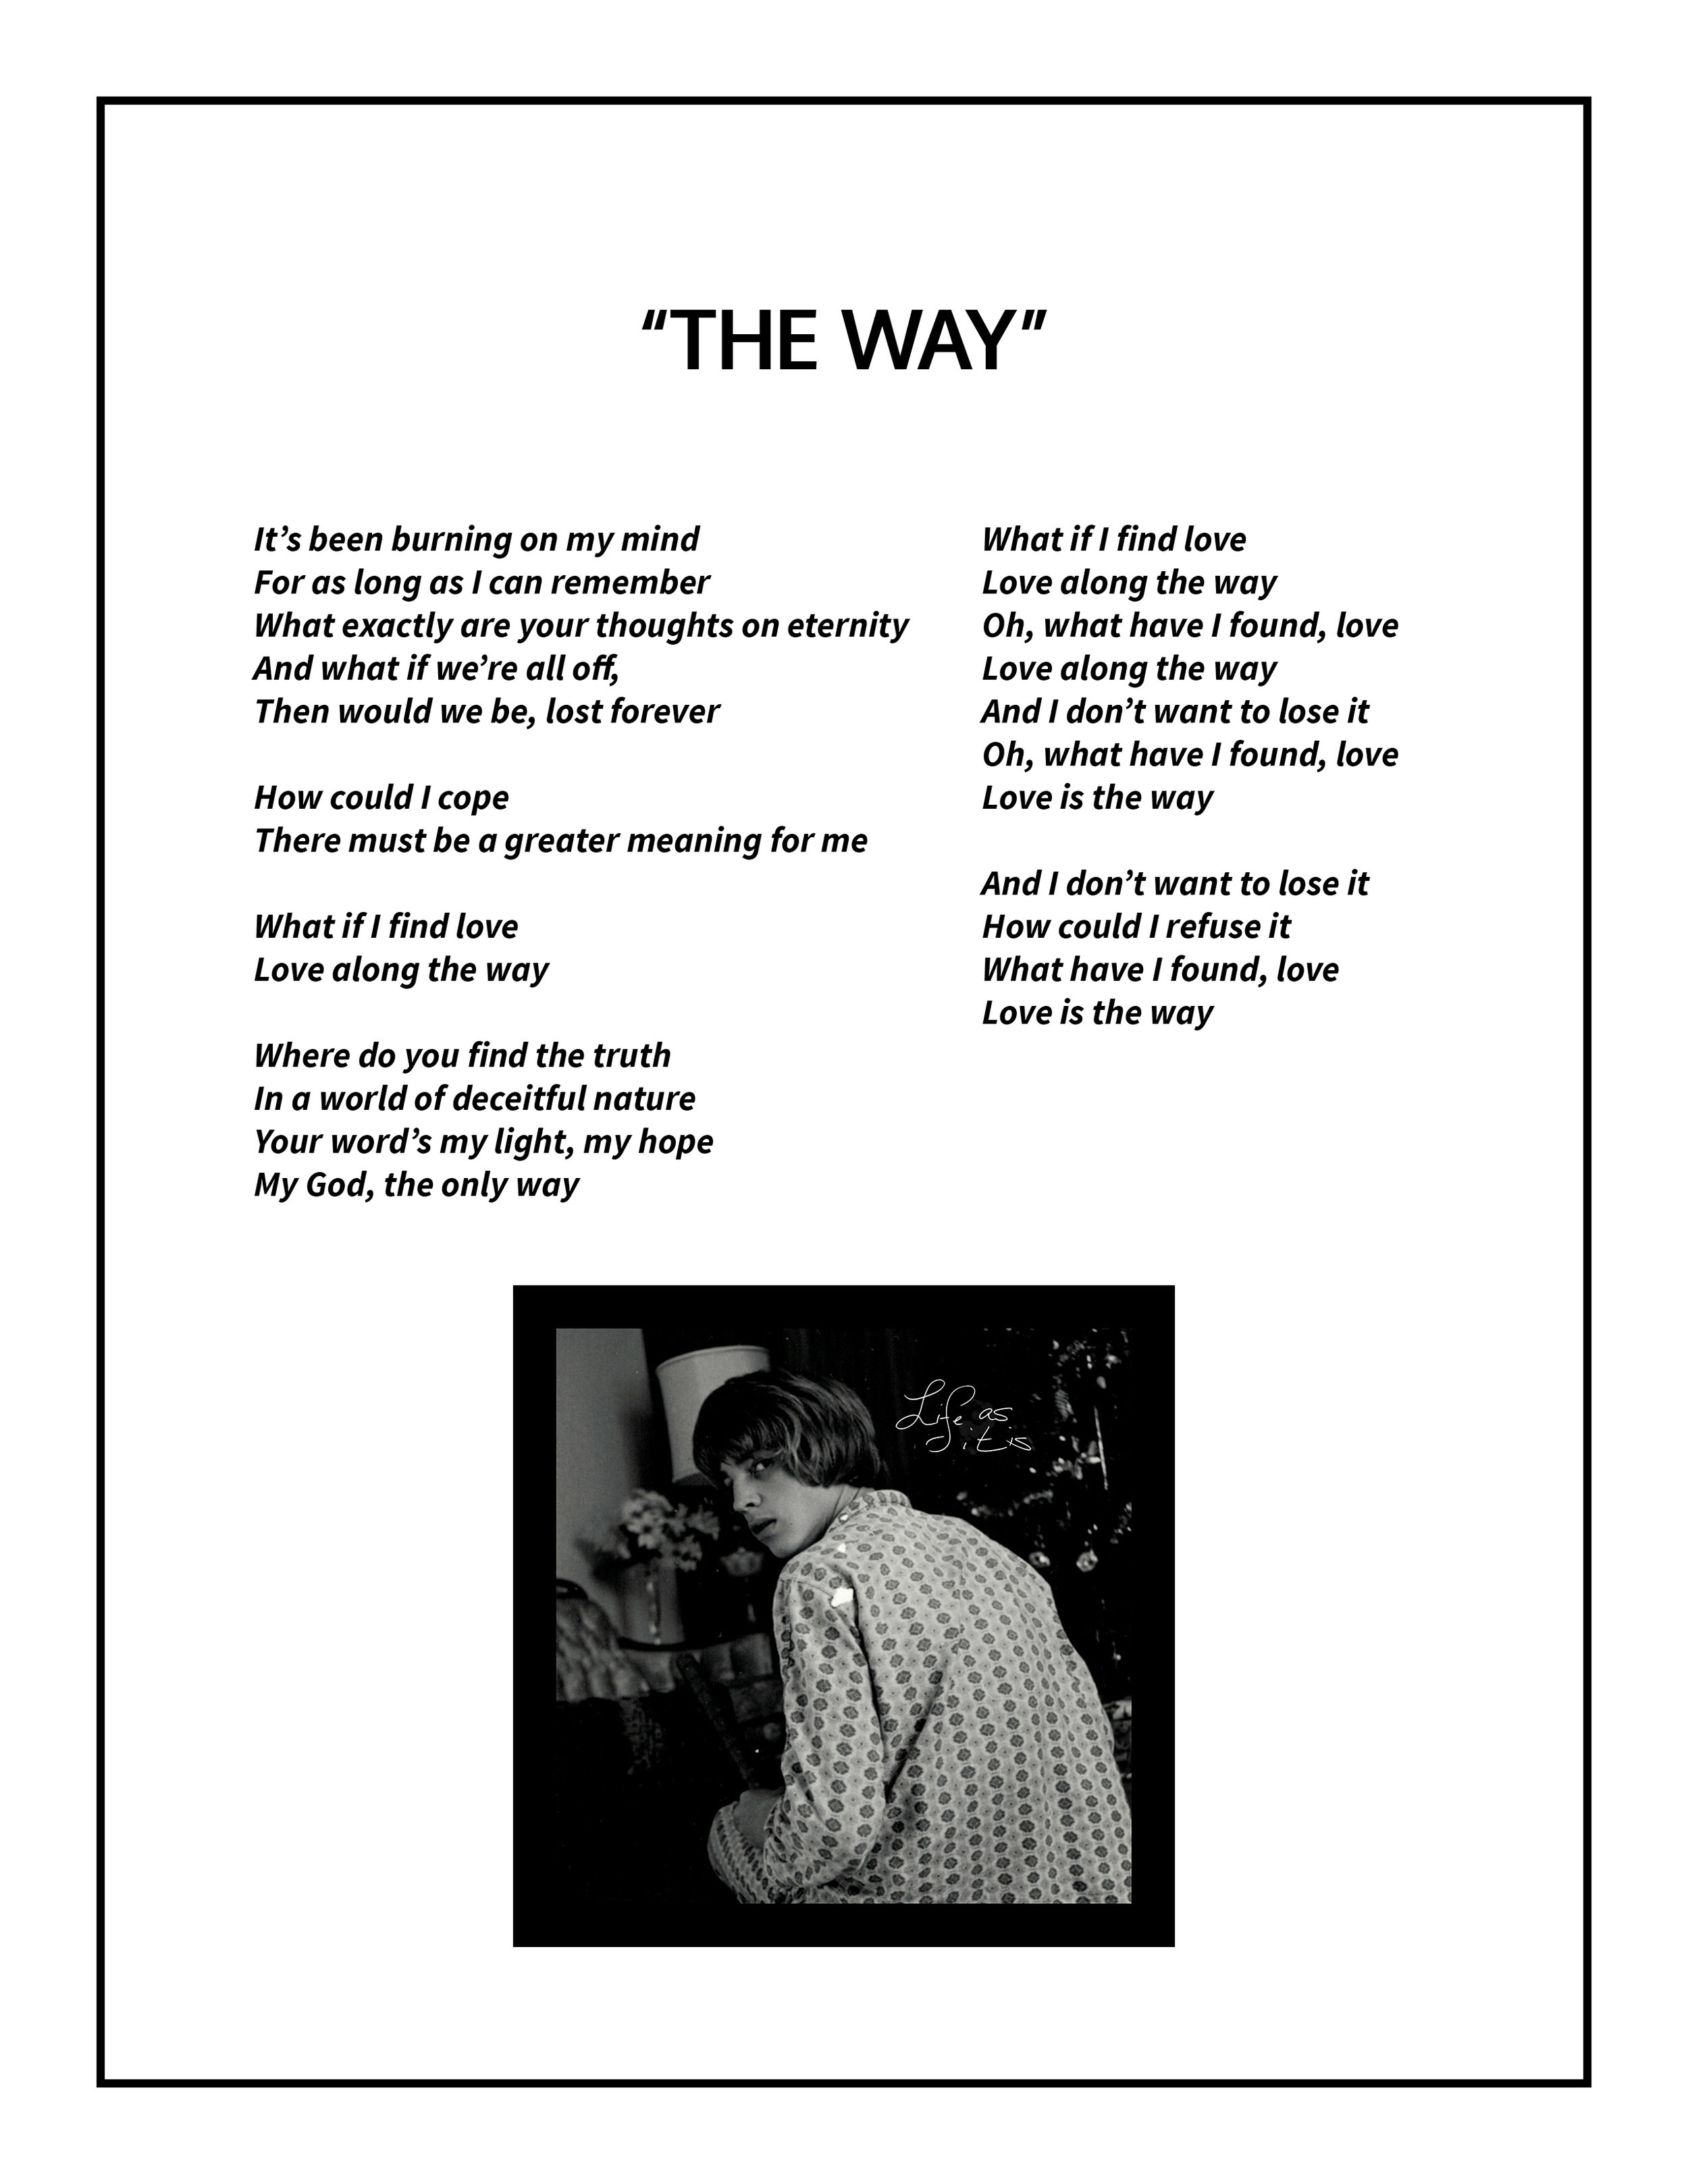 The Way Lyrics